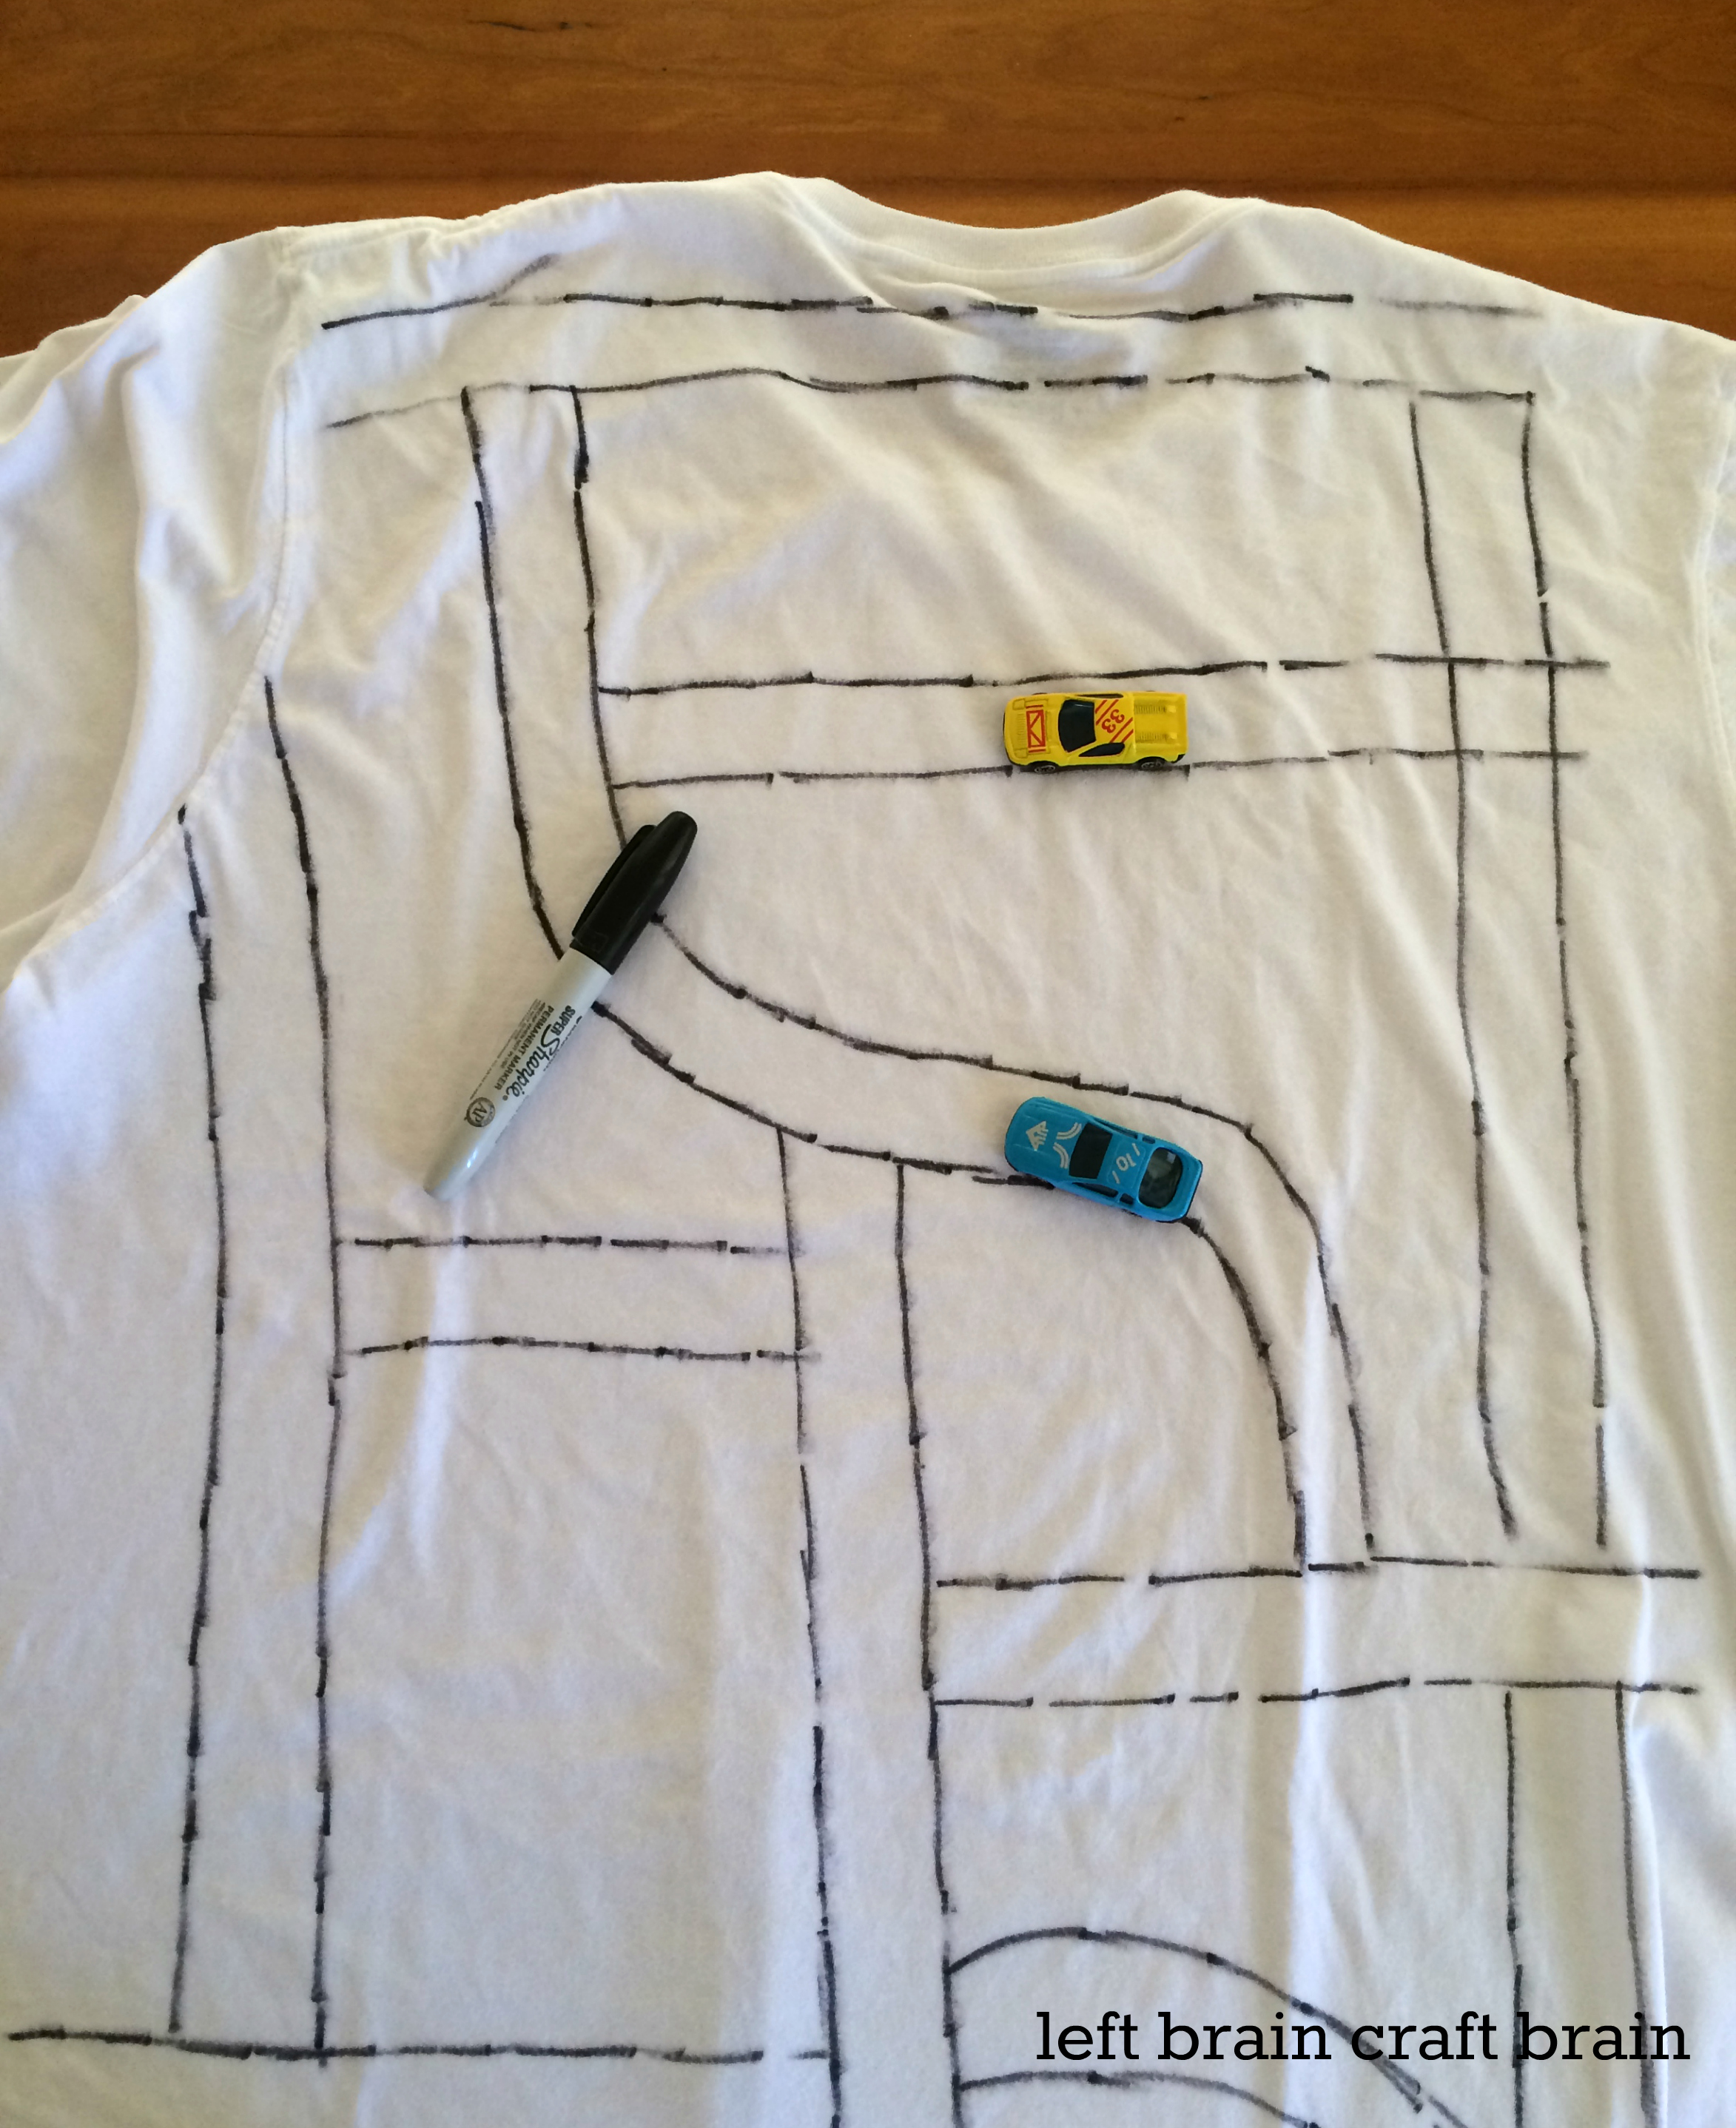 race track back scratcher t shirt left brain craft brain image